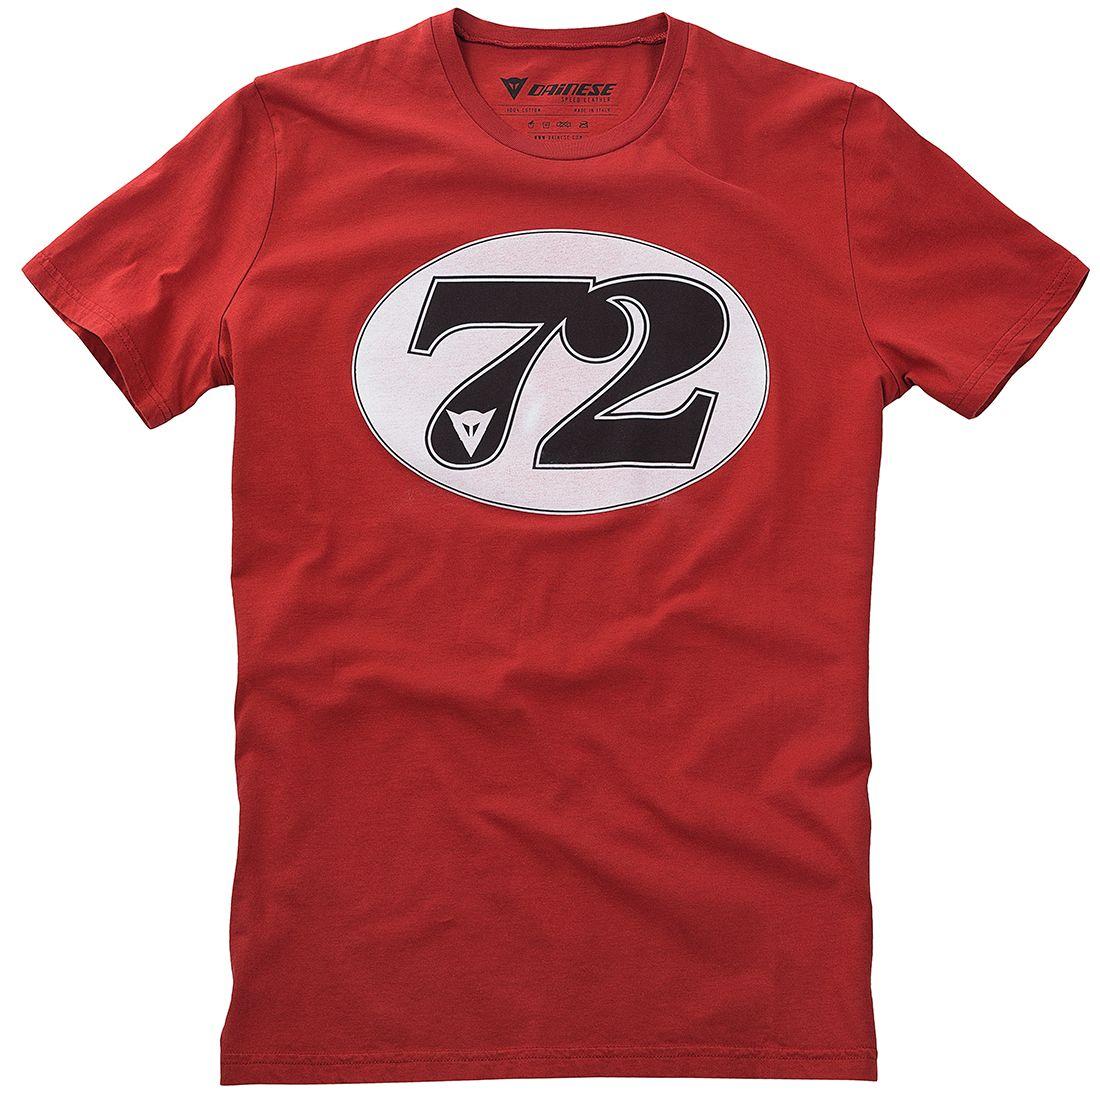 【DAINESE】NUMBER 72 T恤 - 「Webike-摩托百貨」